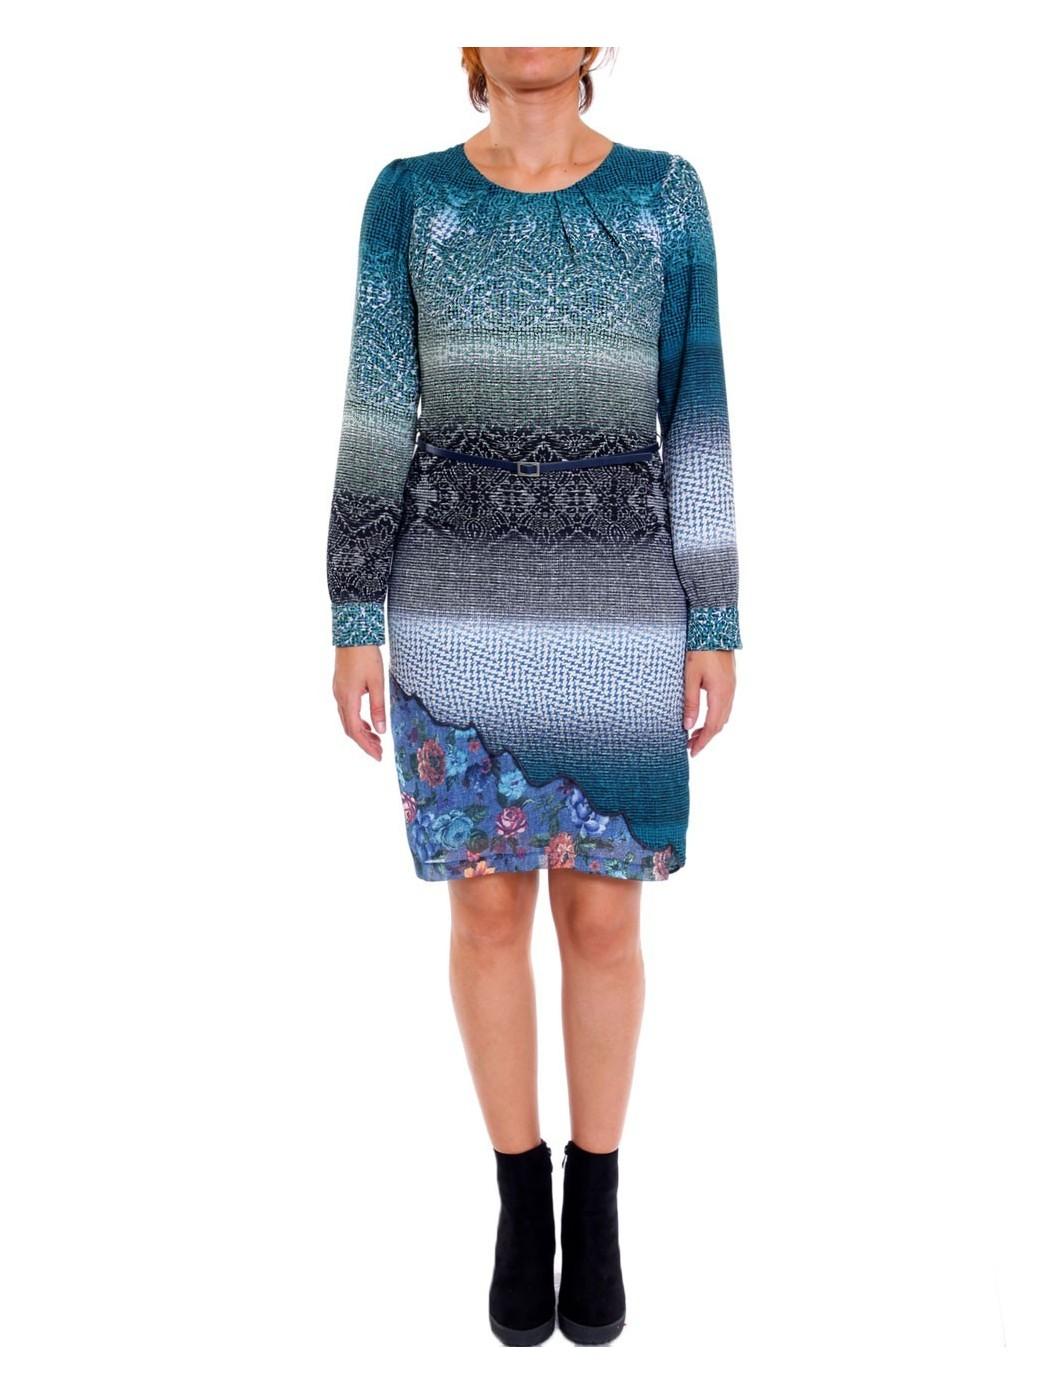 Paz Torras dress